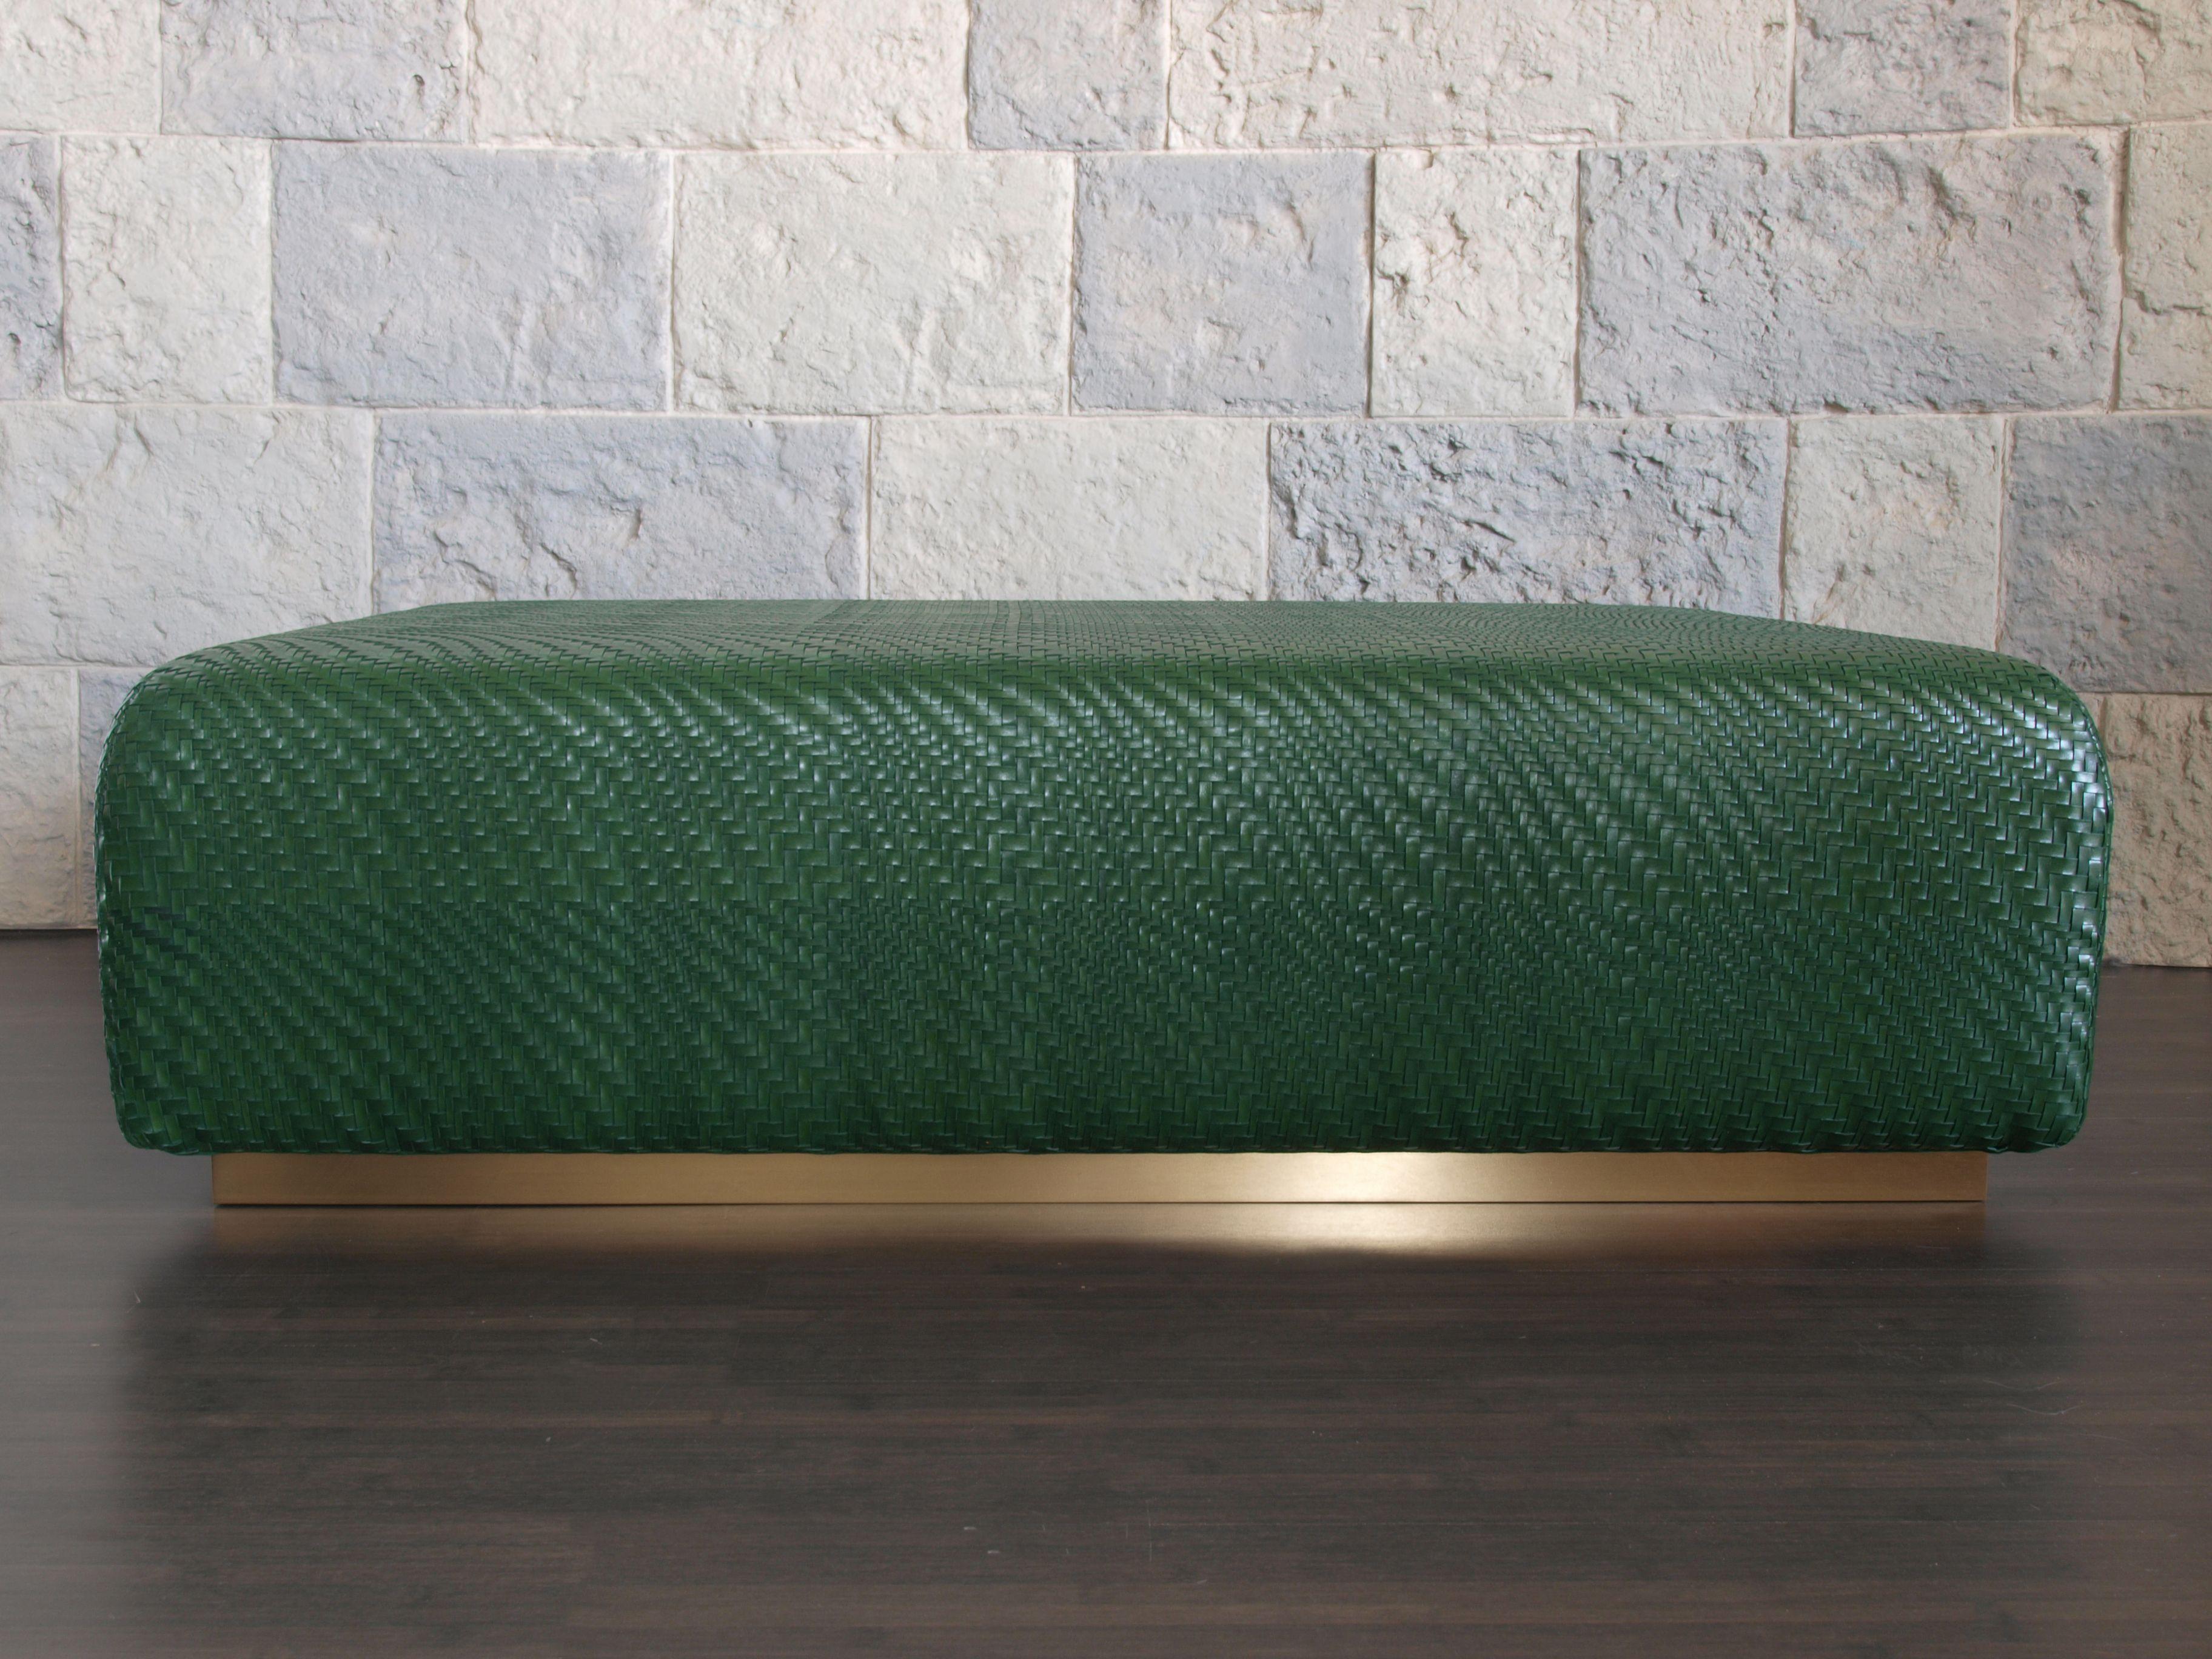 Strange Cobblestone Woven Leather Ottoman In Bottle Green Lamtechconsult Wood Chair Design Ideas Lamtechconsultcom